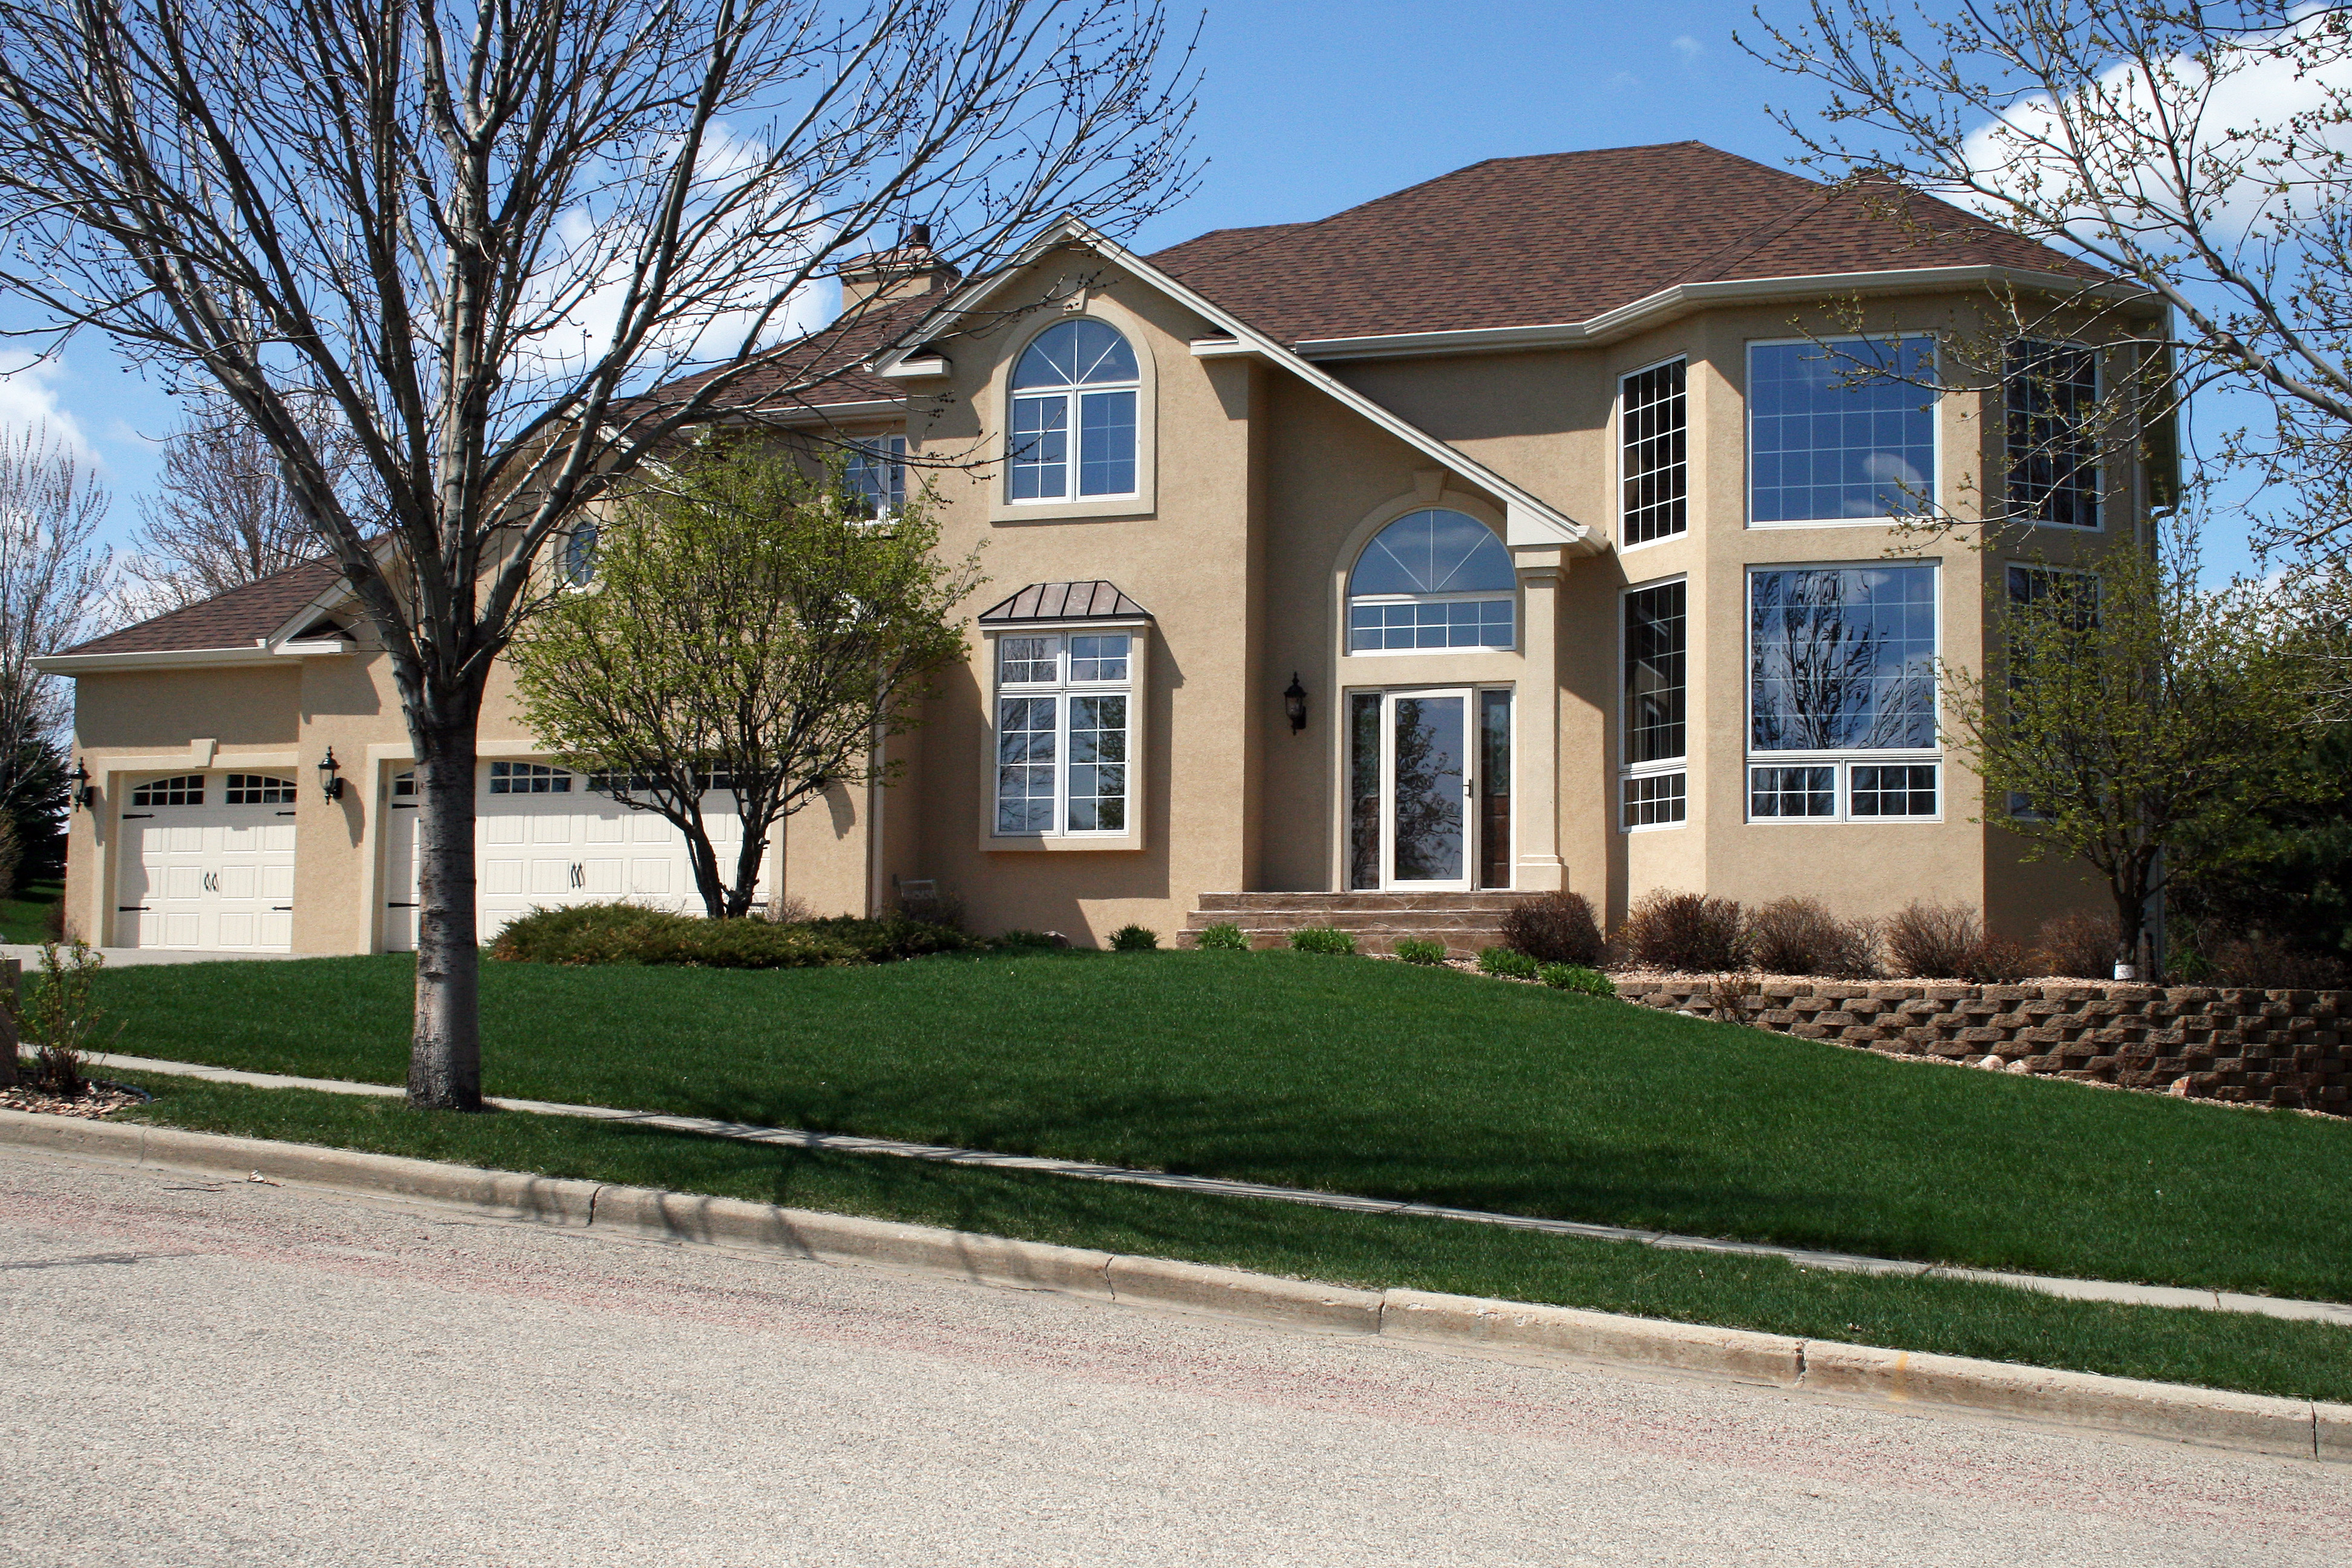 home affordability calculator,mortgage affordability calculator,mortgage loan calculator